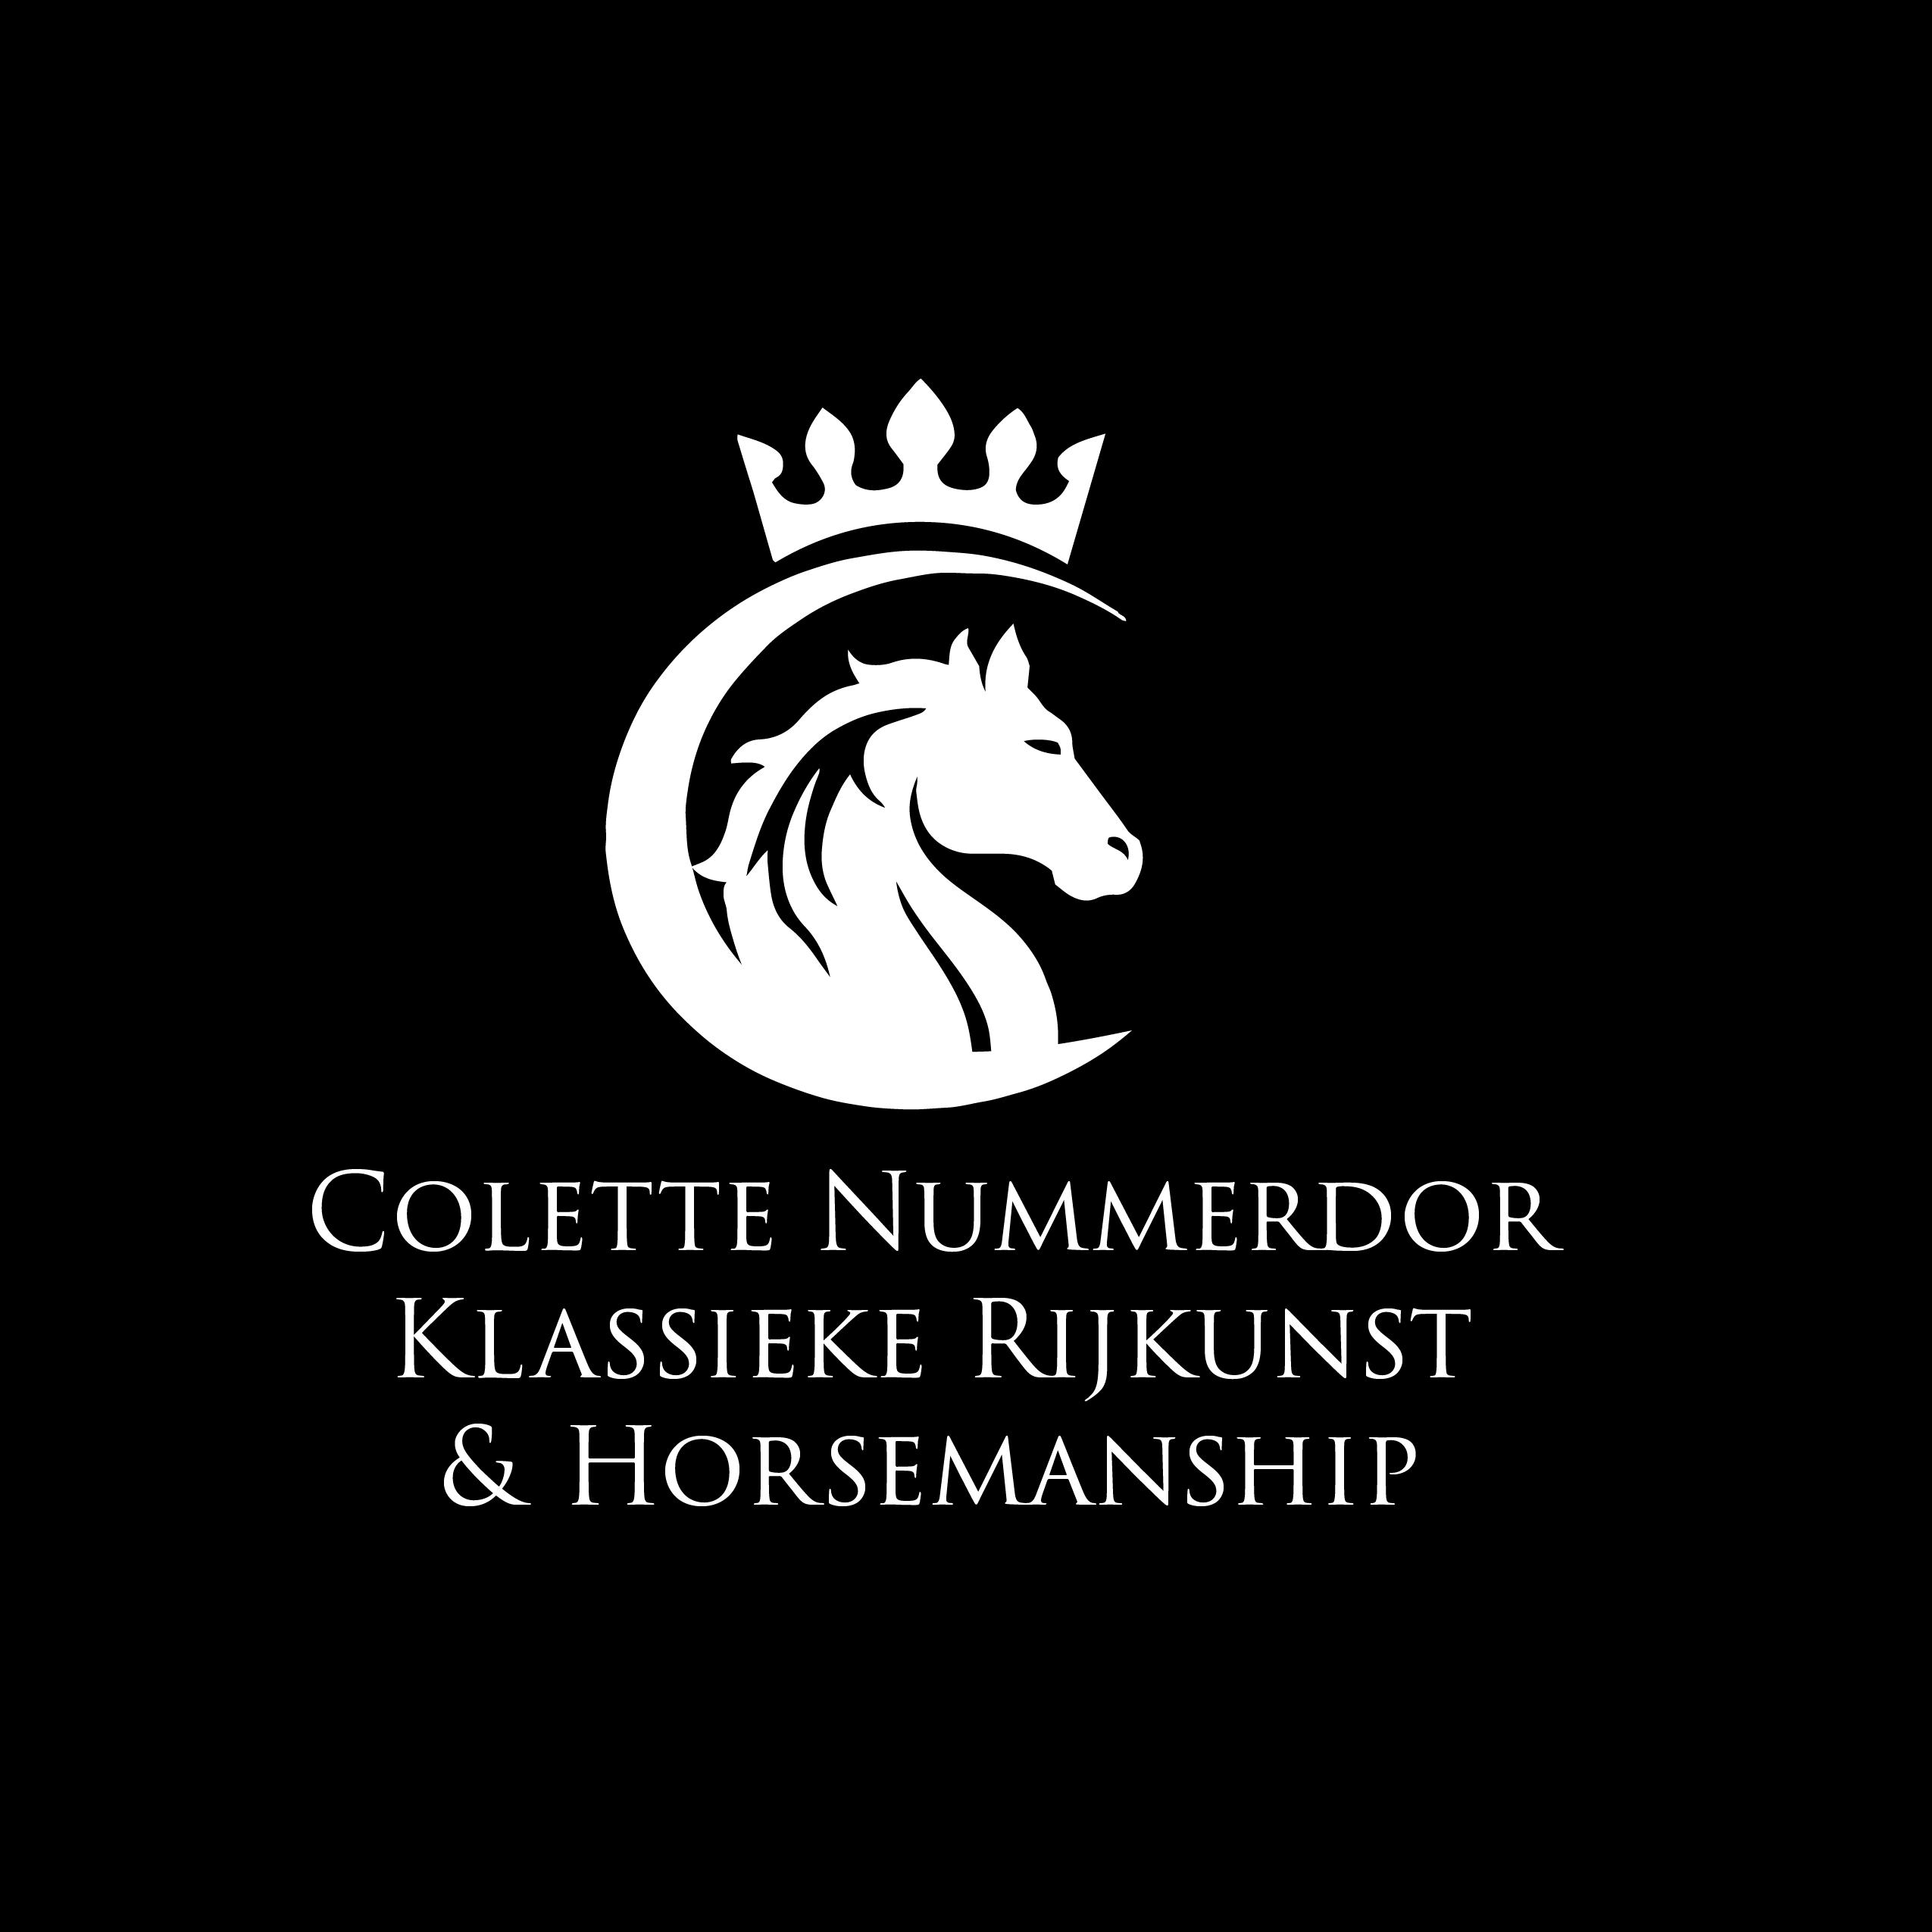 Colette Nummerdor Klassieke Rijkunst & Horsemanship